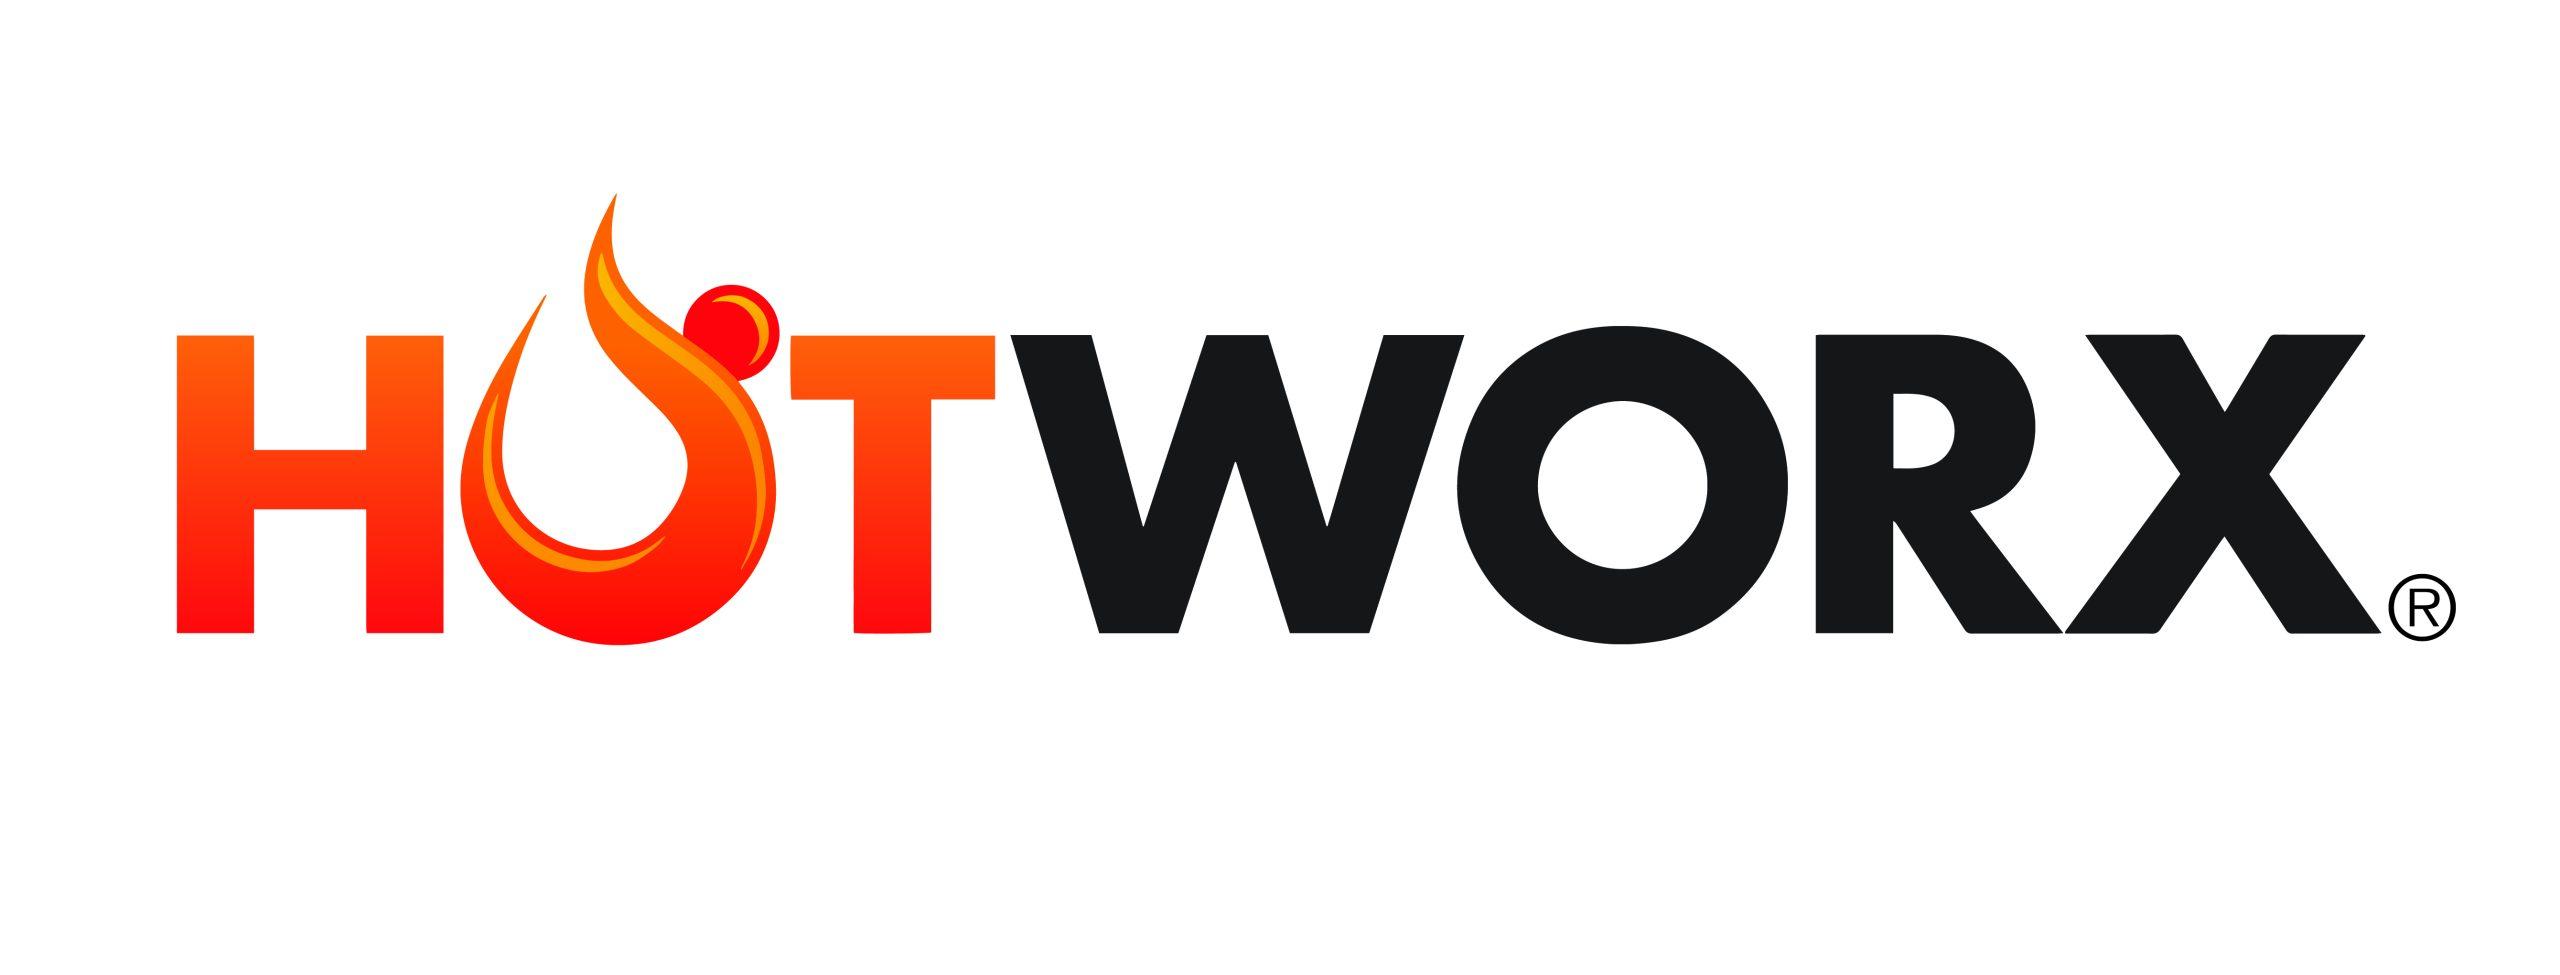 Featured Client HOTWORX